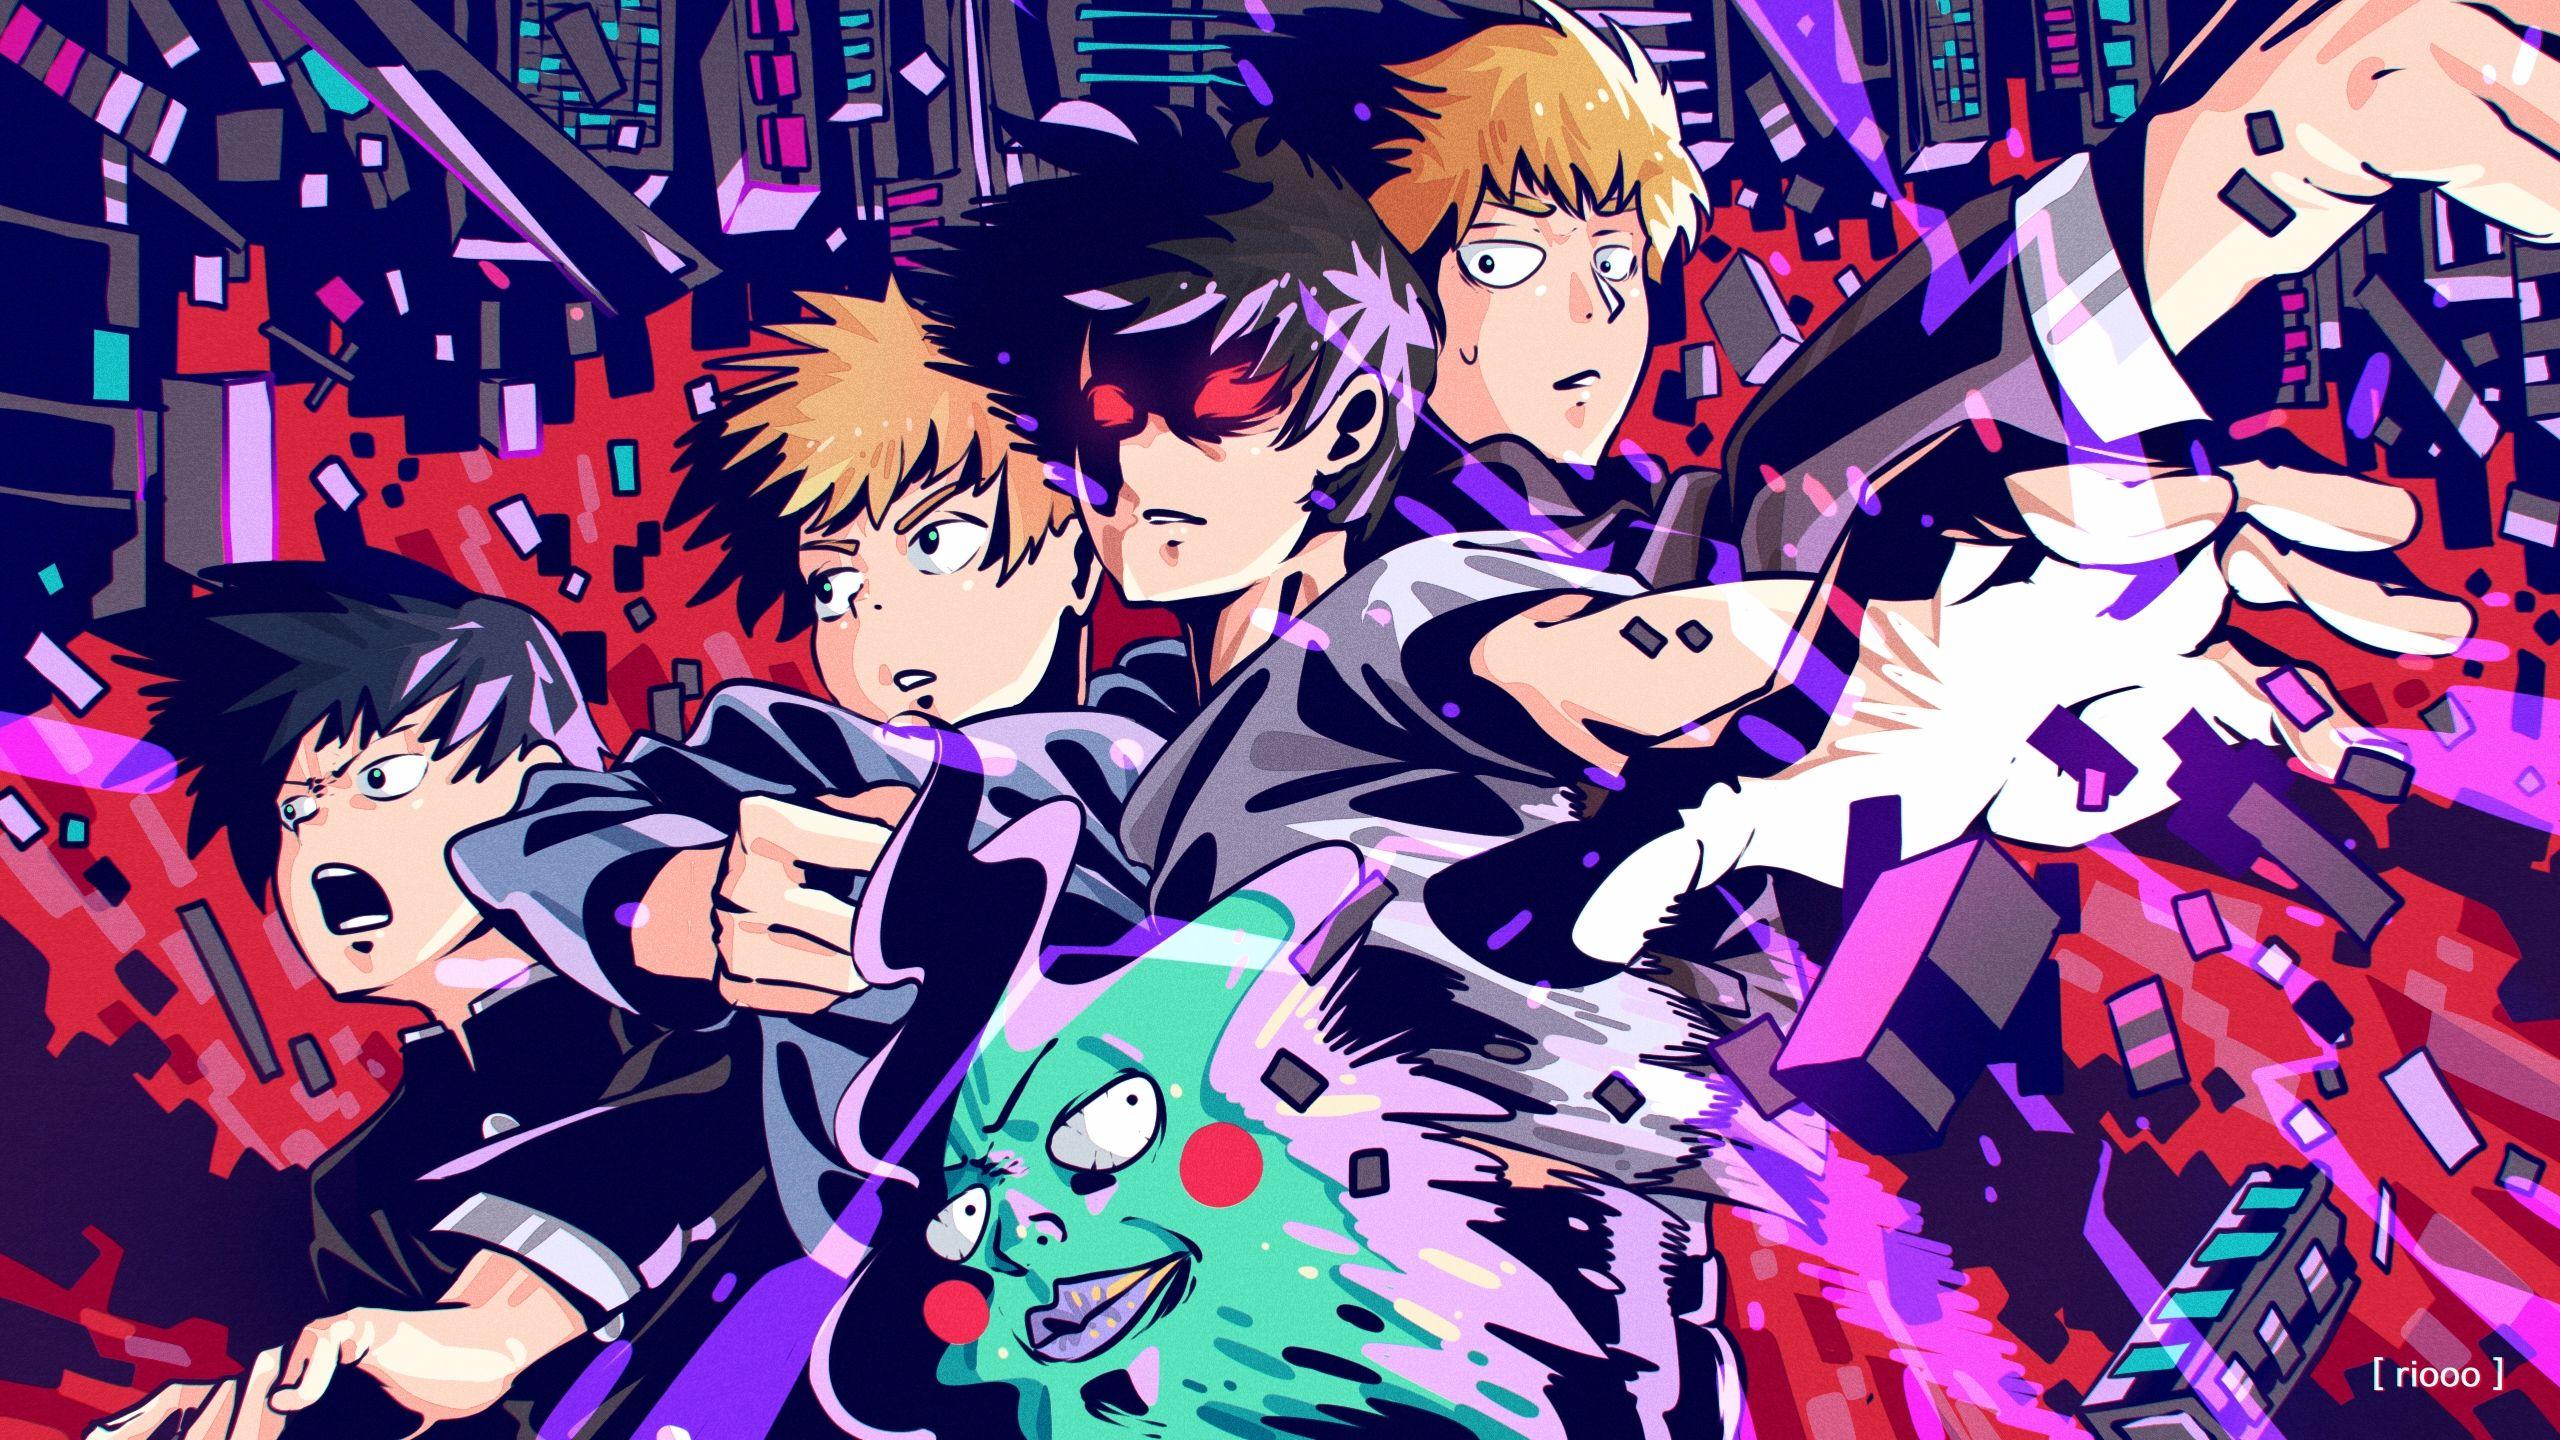 Pinterest Mob Psycho 100 Anime Mob Psycho Mob Psycho 100 Wallpaper